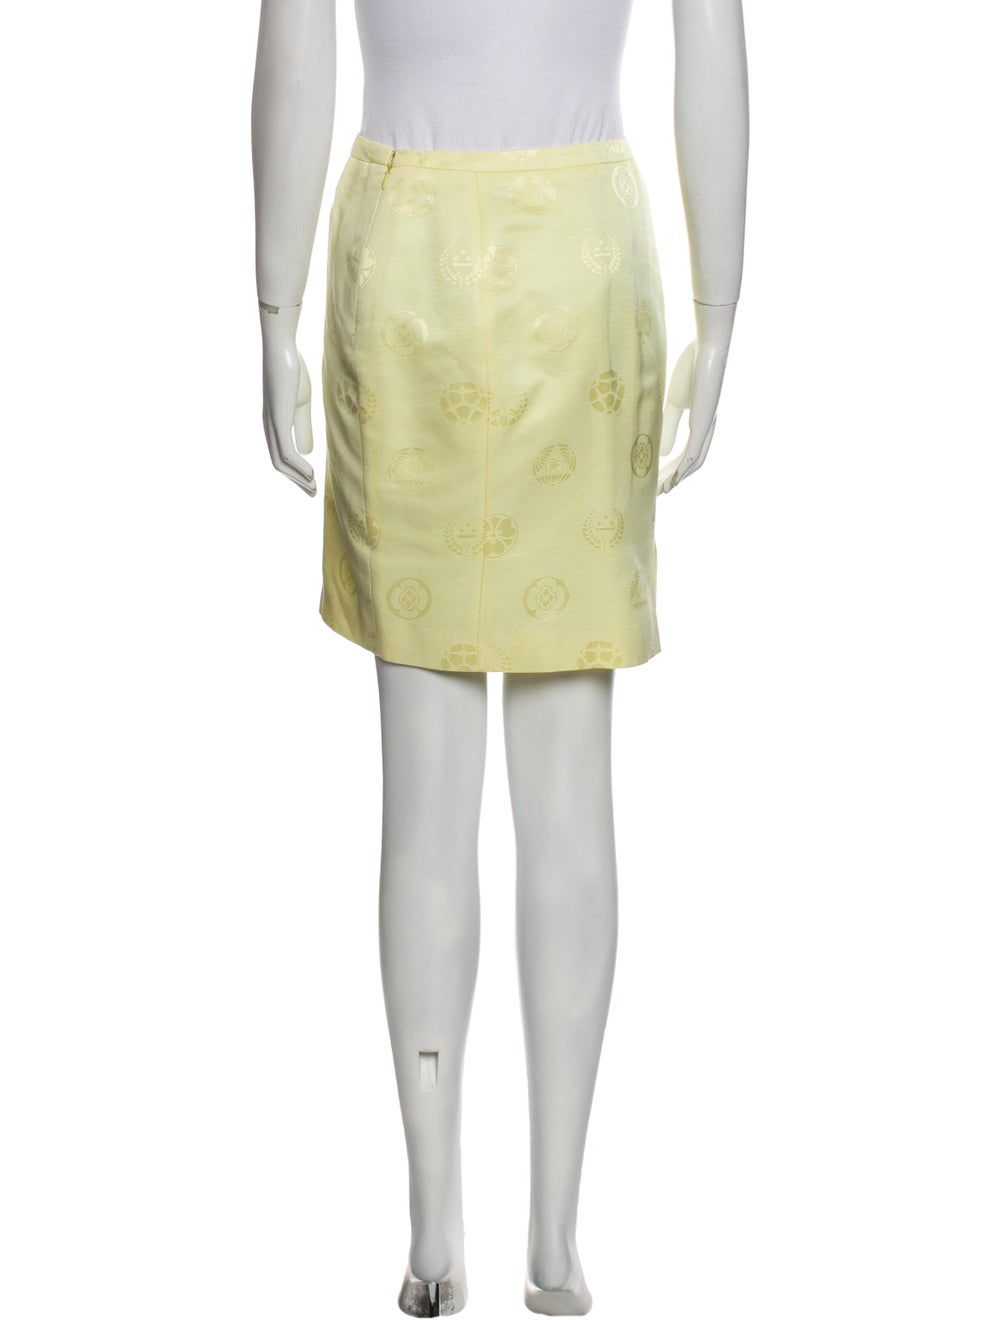 Gianni Versace Vintage Mini Skirt Yellow - image 3